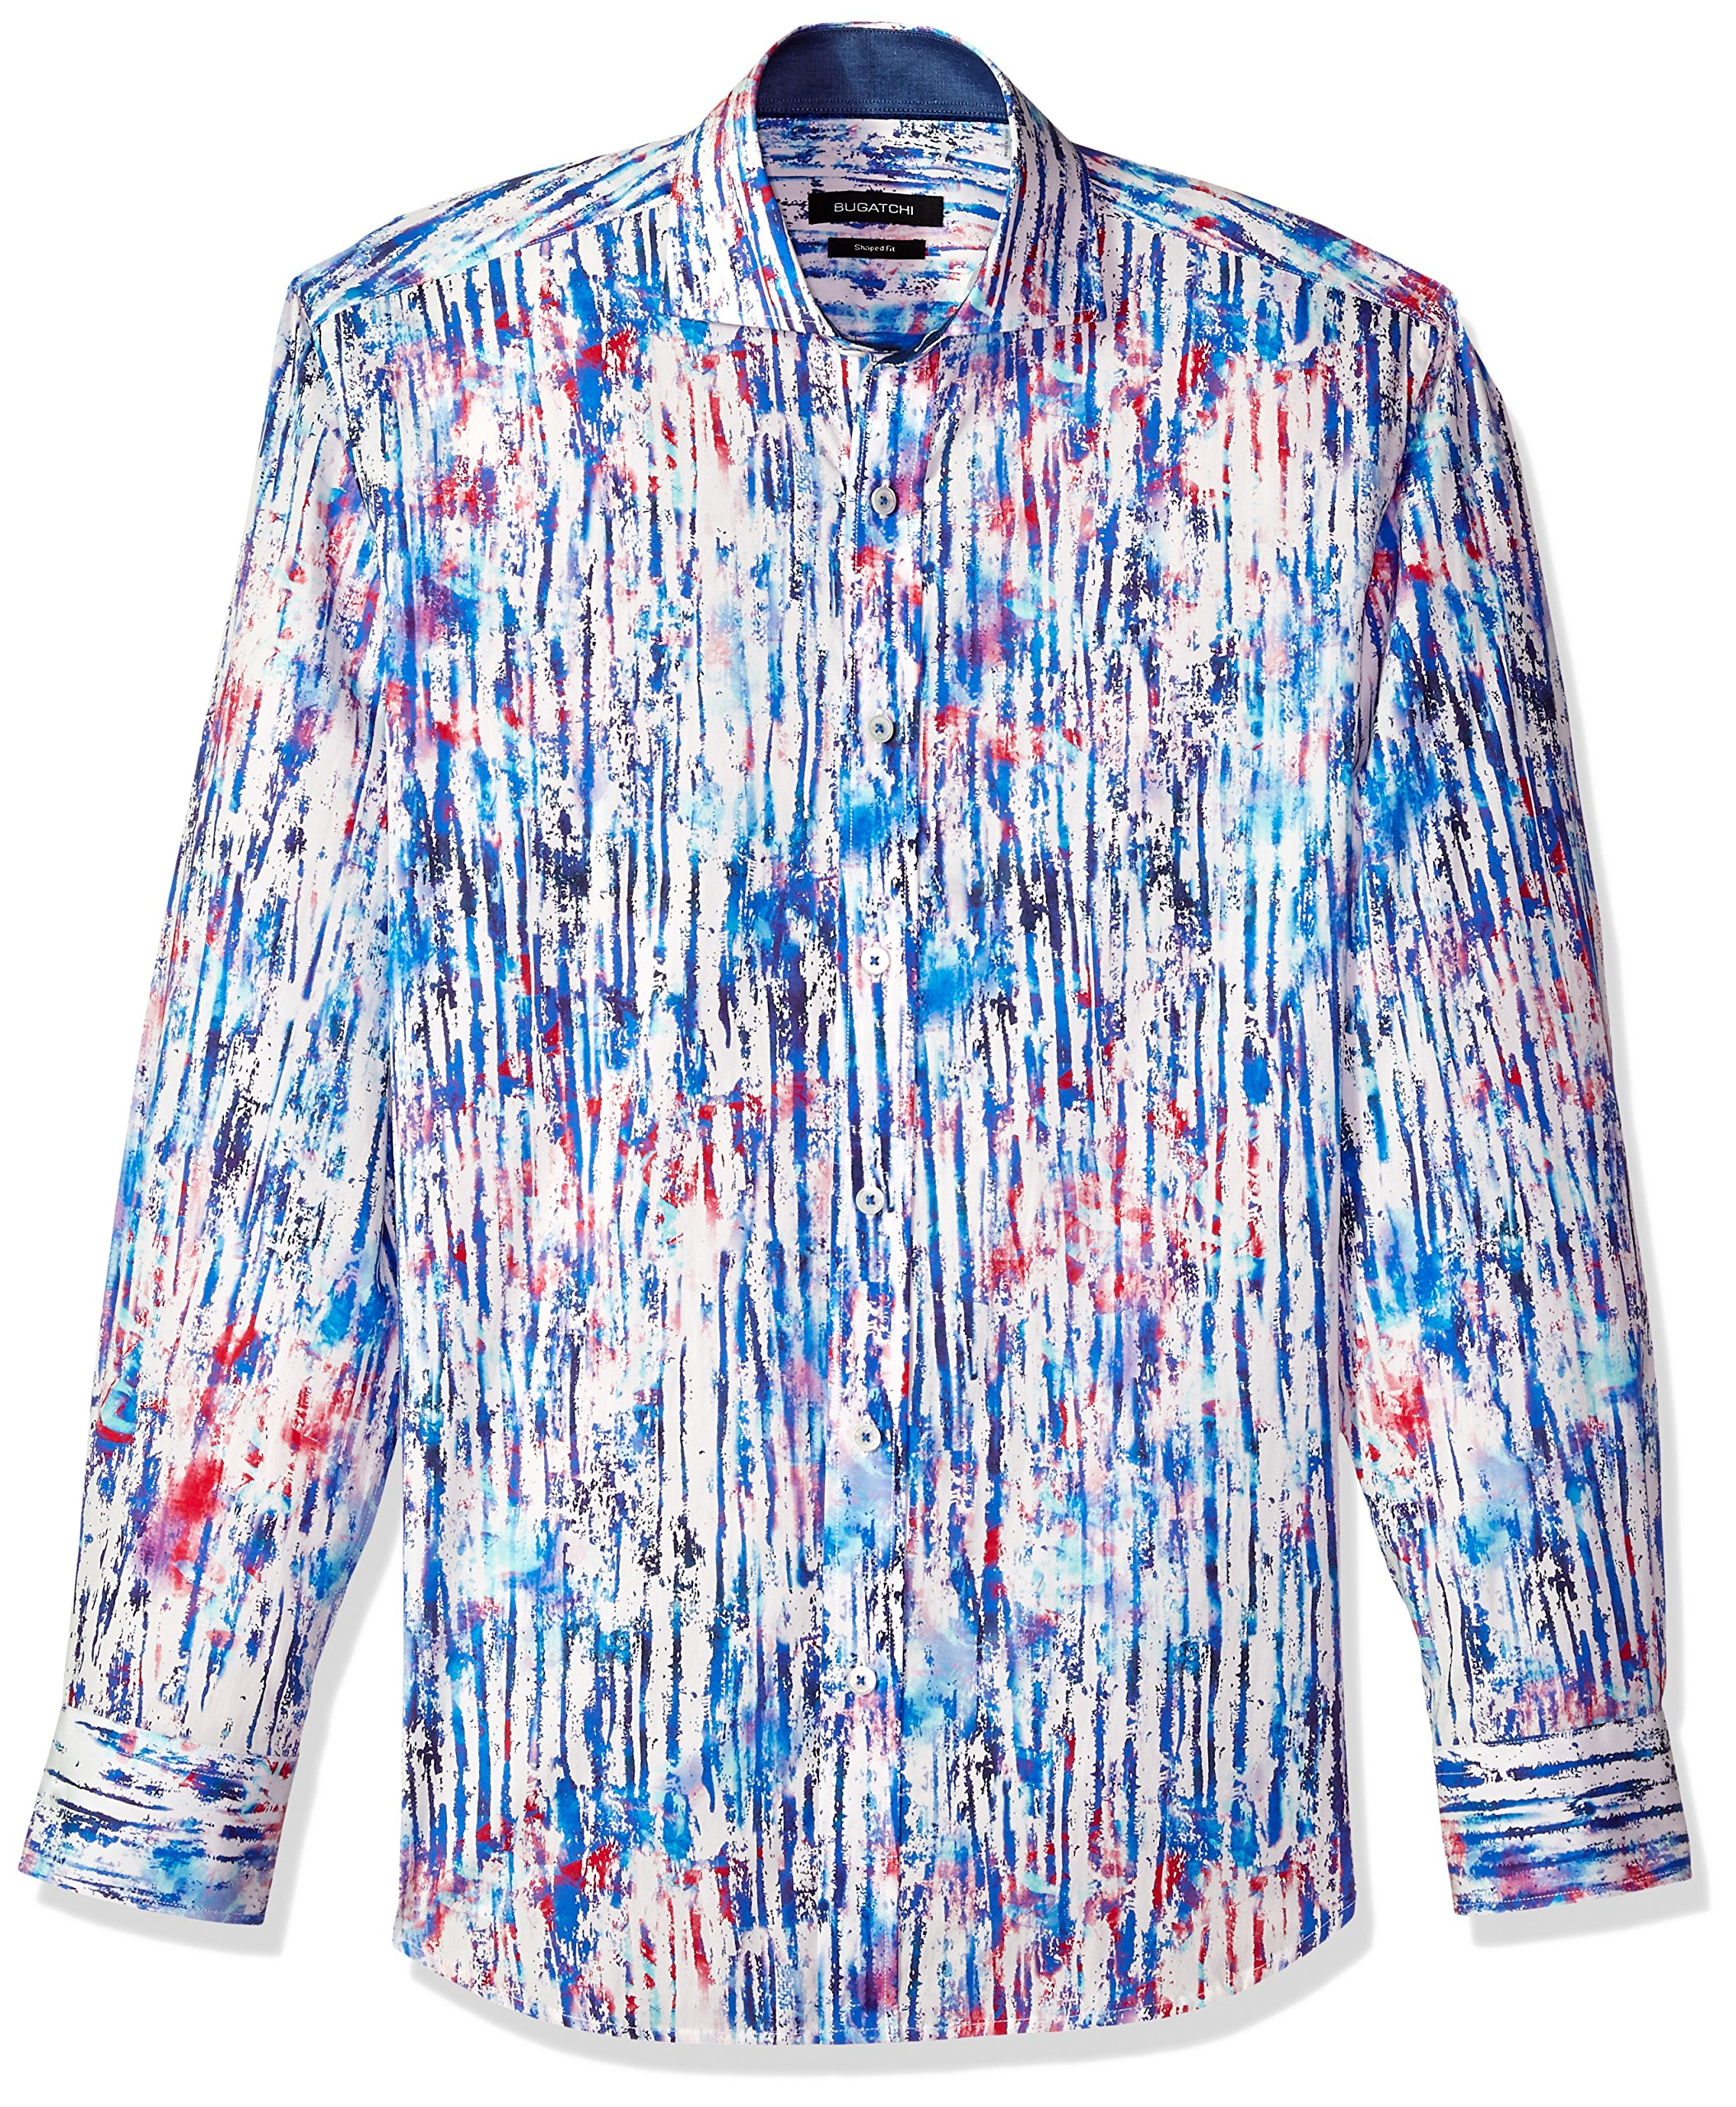 Bugatchi Men's Printed Cotton Slim Fit Spread Collar Woven Shirt, Classic Blue, XXL